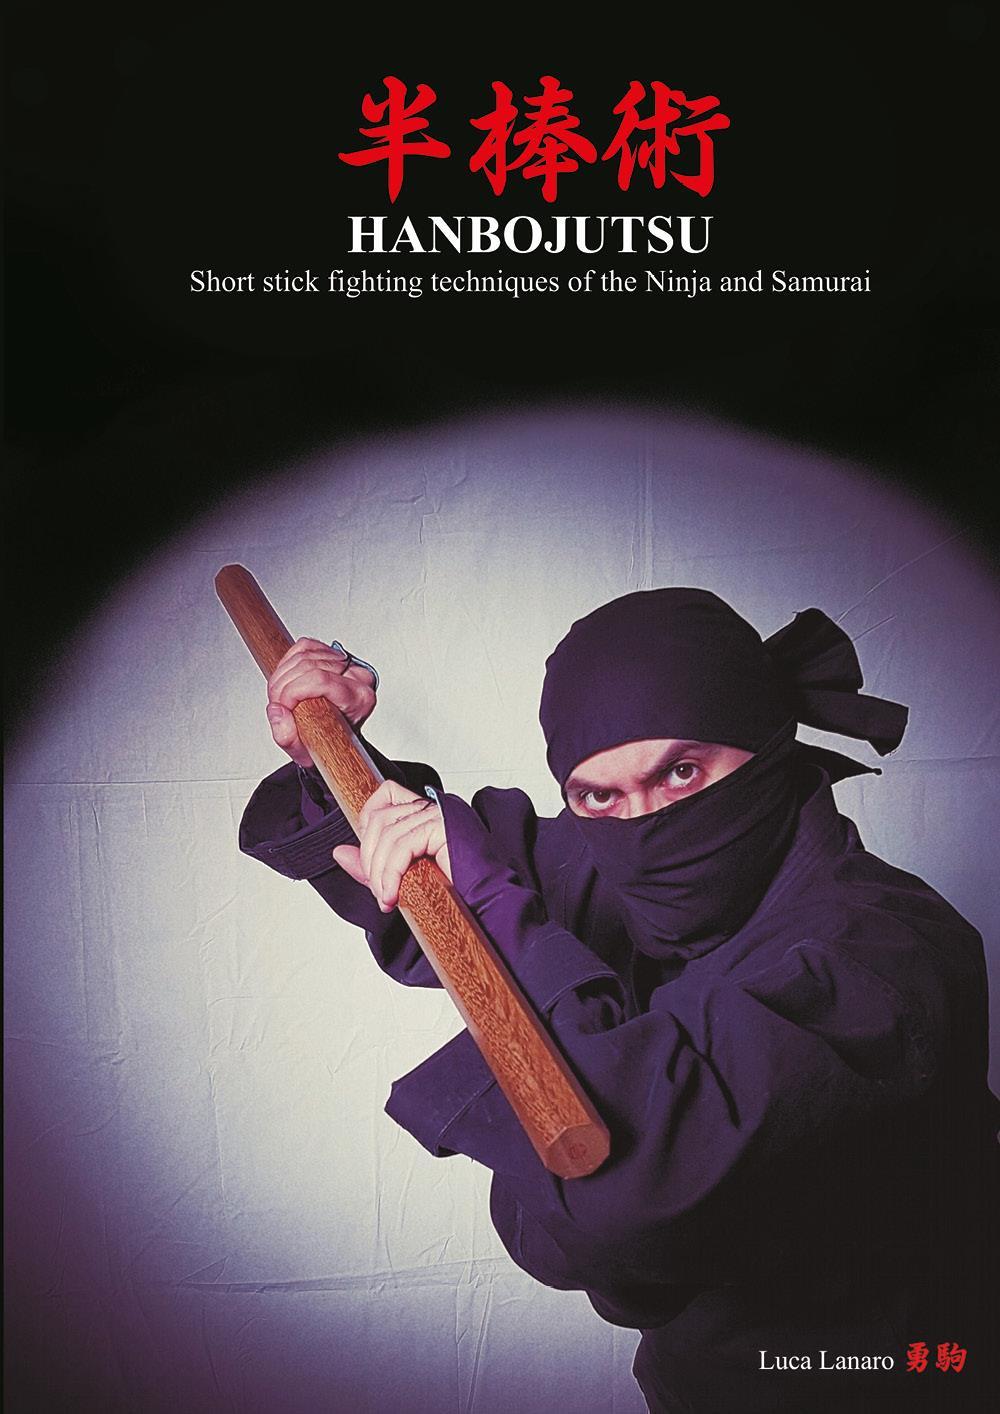 HANBOJUTSU Short stick fighting techniques of the Ninja and Samurai